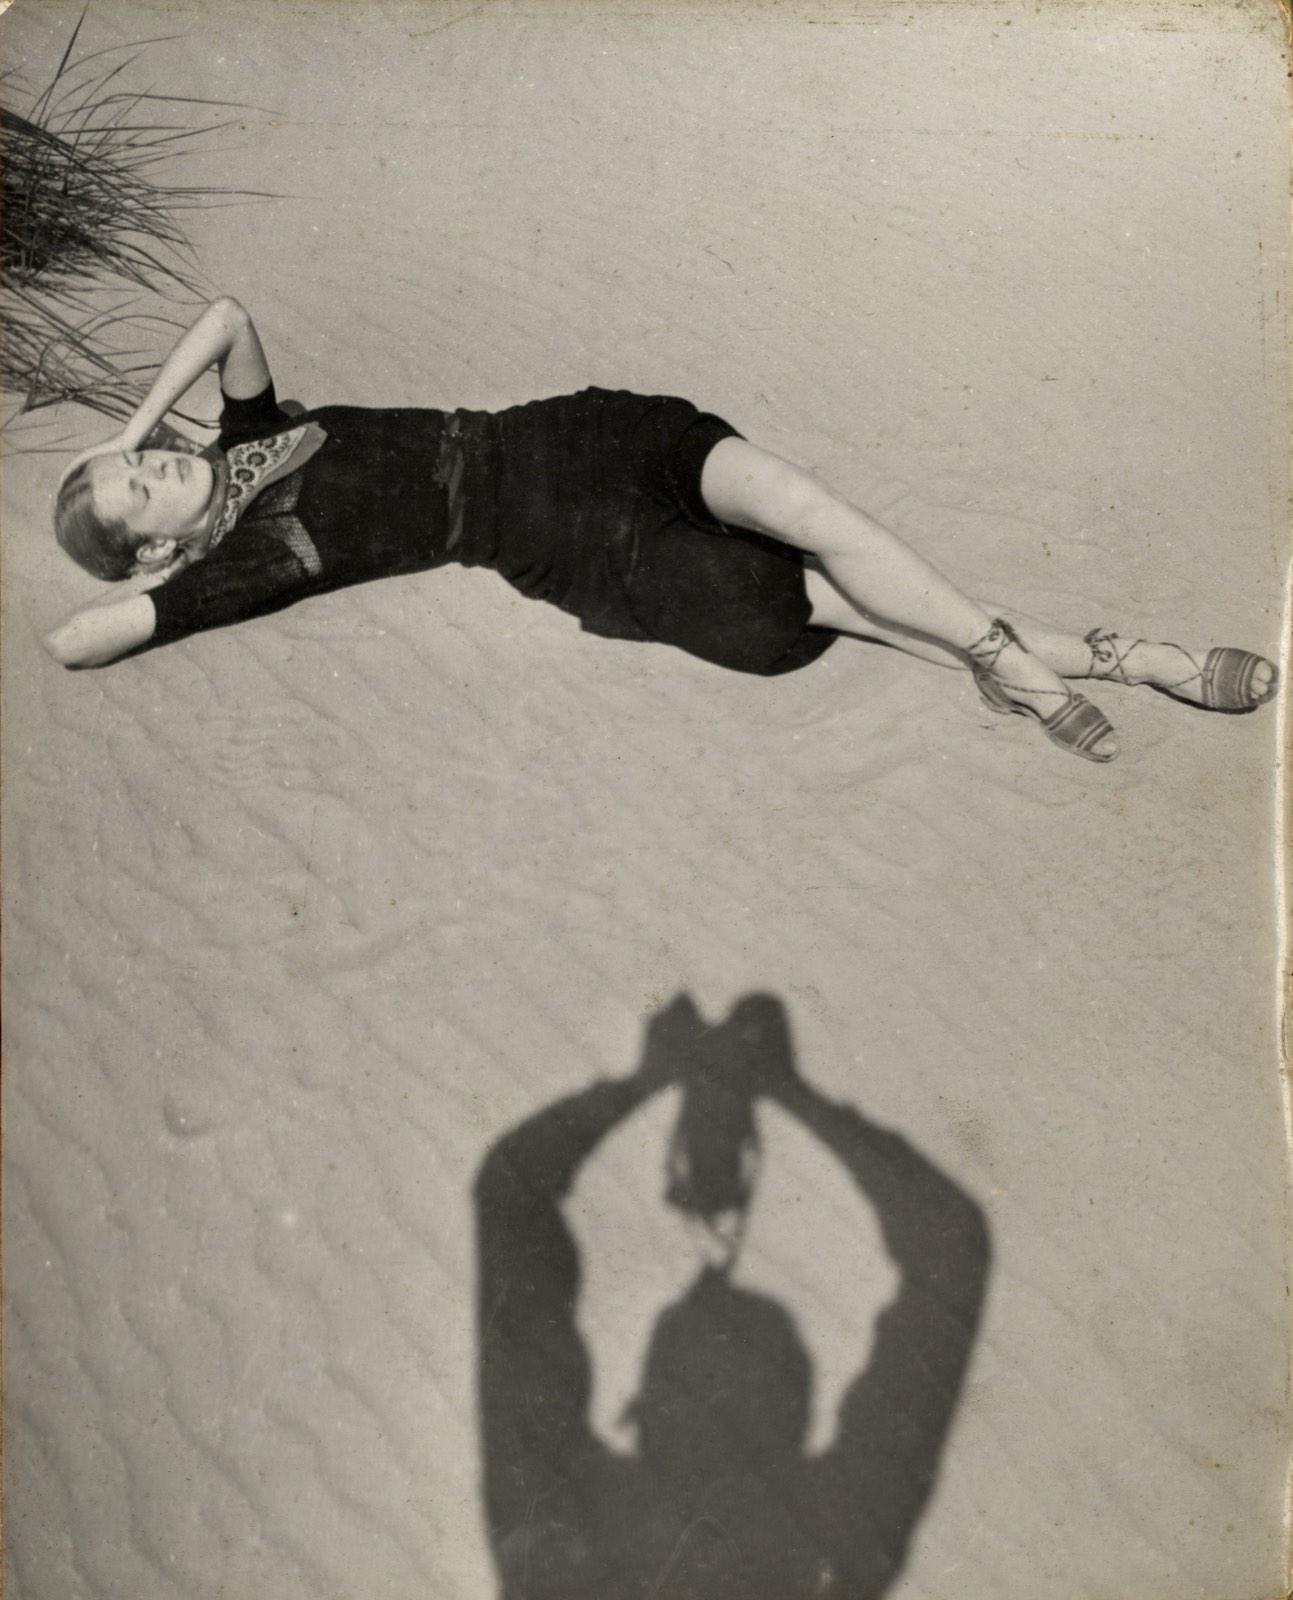 foto: Carel Blazer/Maria Austria Instituut - Zelfportret met Ineke, 1933